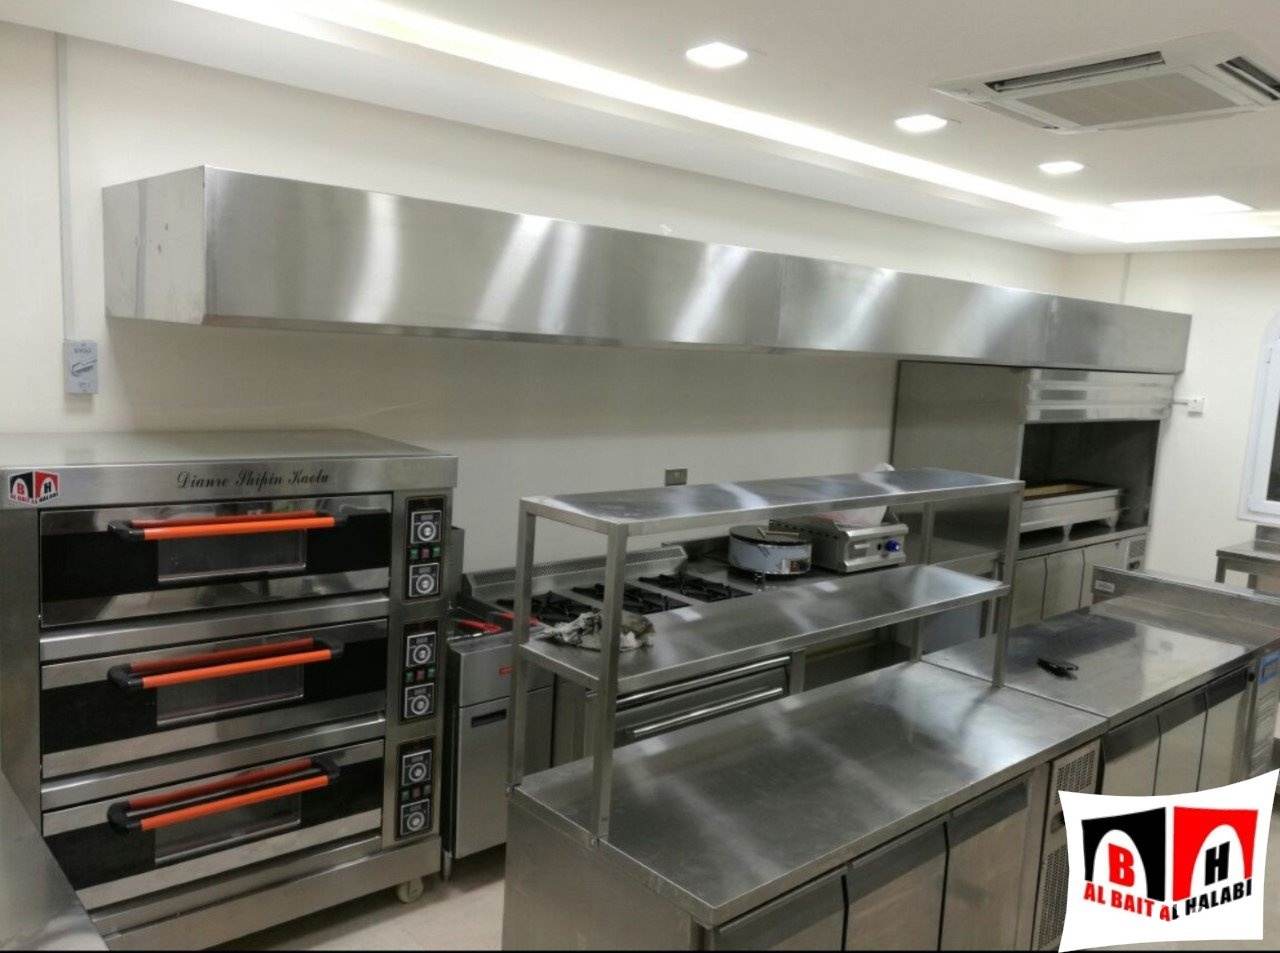 Al Bait Al Halabi Kitchen & Hotel Equipment Trading Company, Sharjah